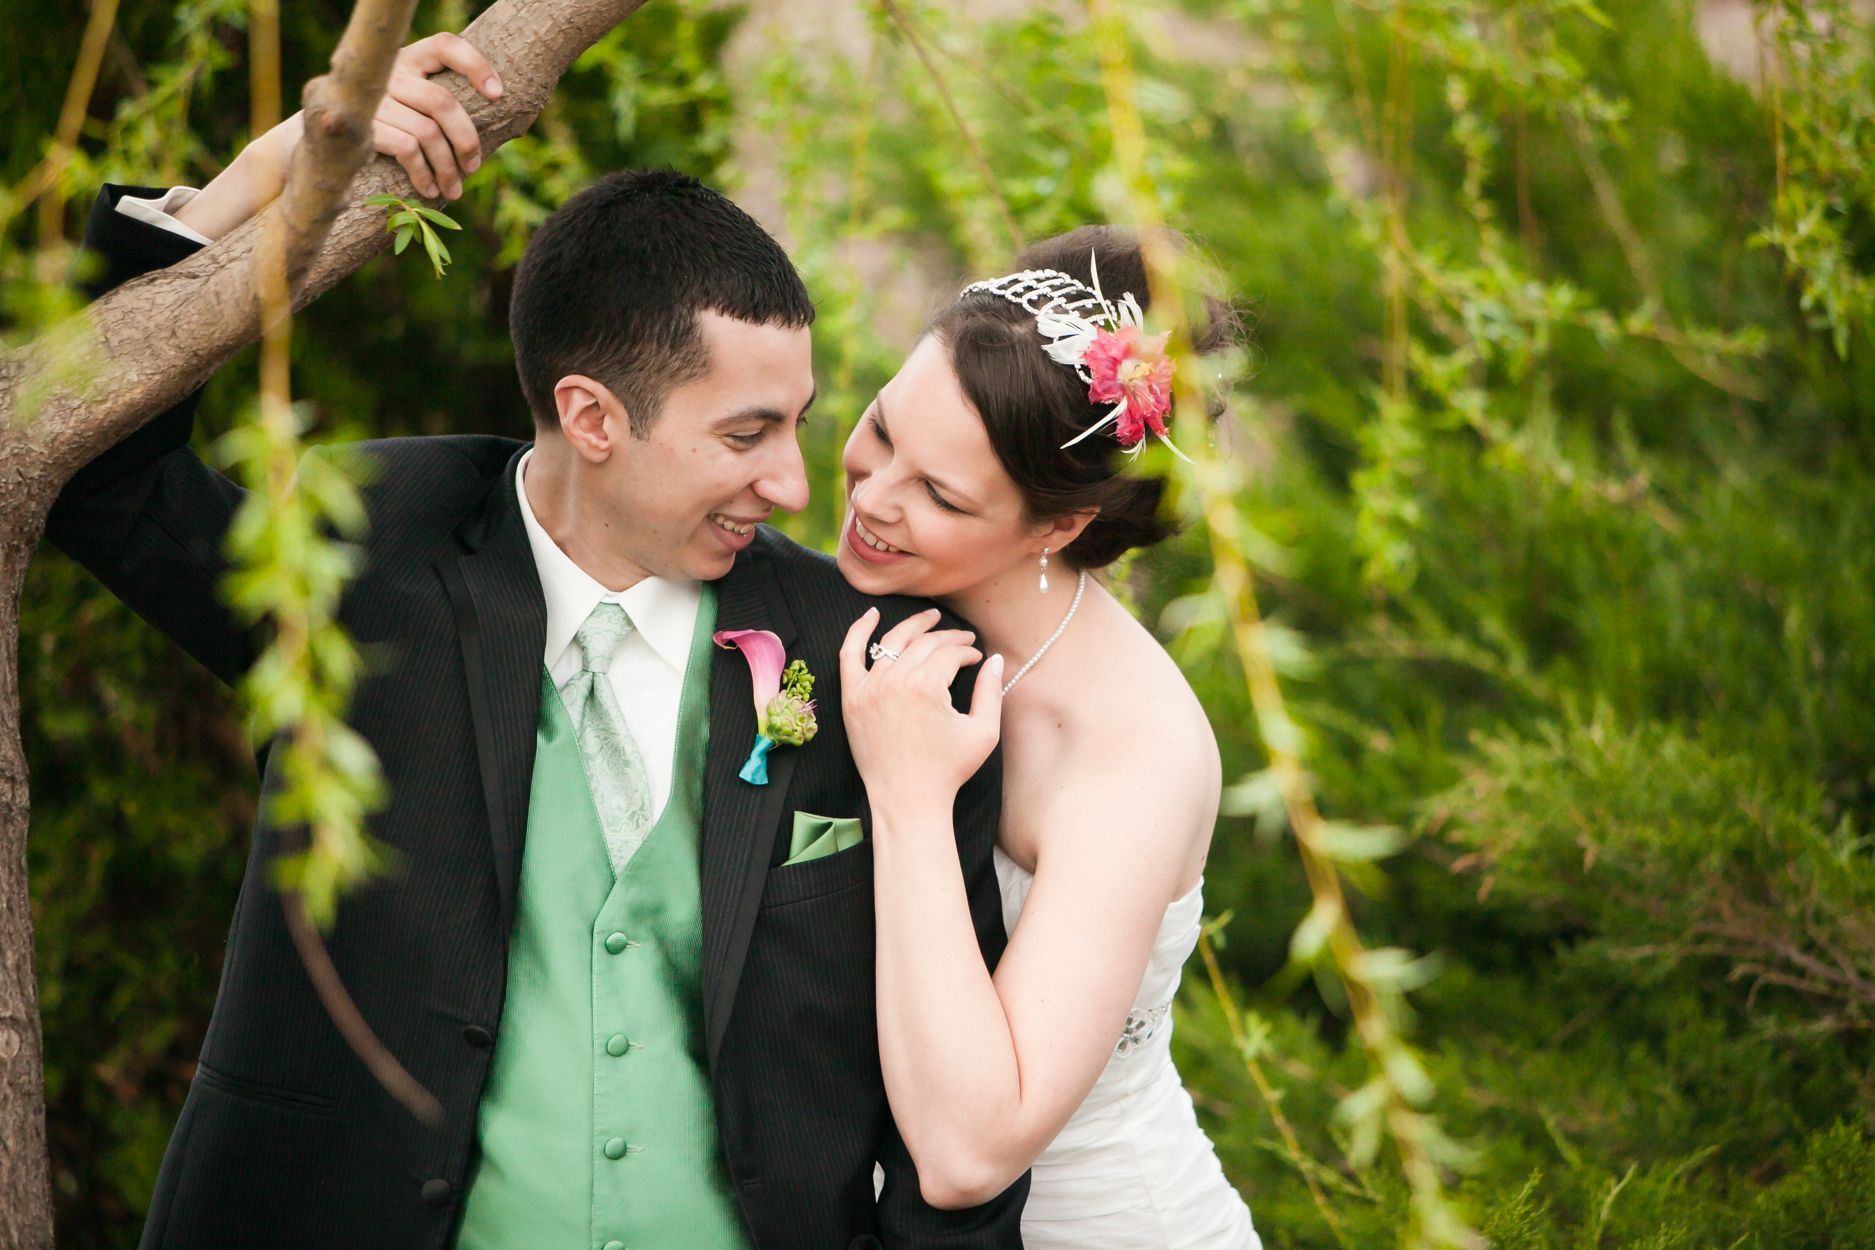 Wedding Poses, Minneapolis wedding photographer 002 | wedding ...